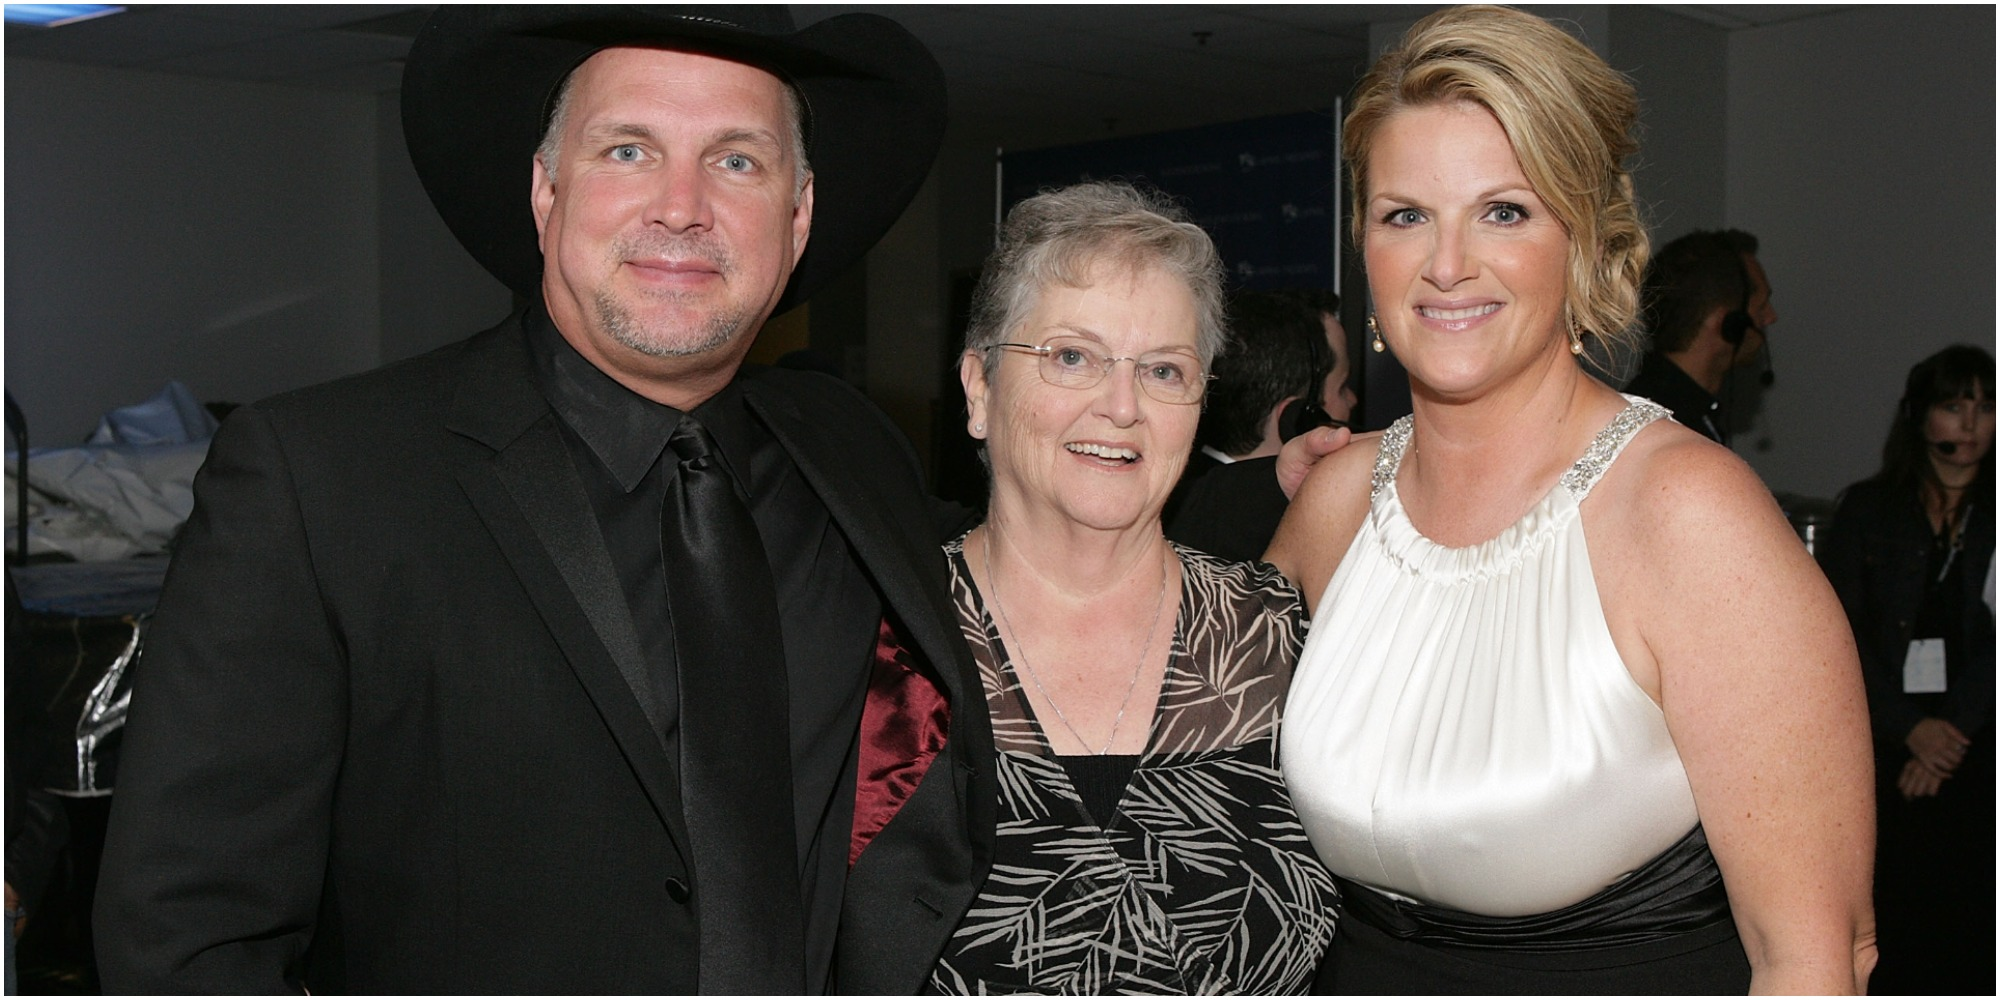 Garth Brooks. Gwen Yearwood and Trisha Yearwood pose at a Hollywood Bowl event.